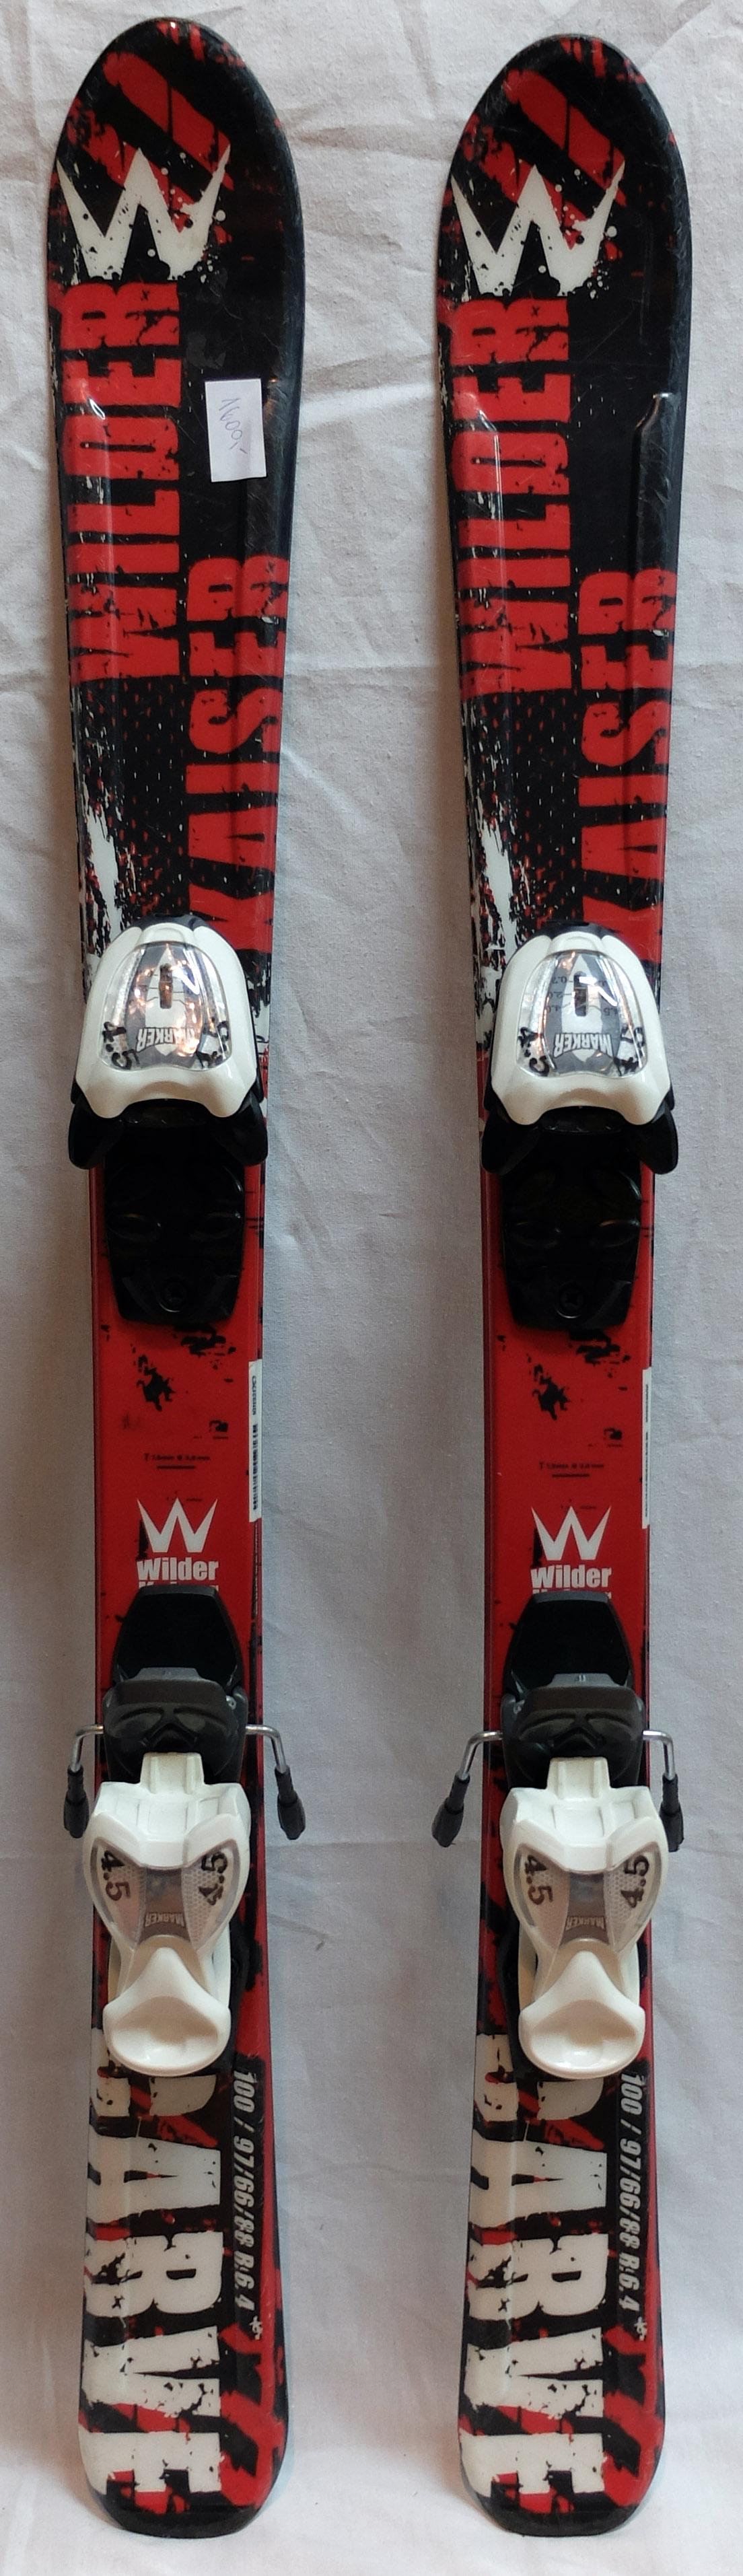 Wilder Kaiser - bazar Délka: 100